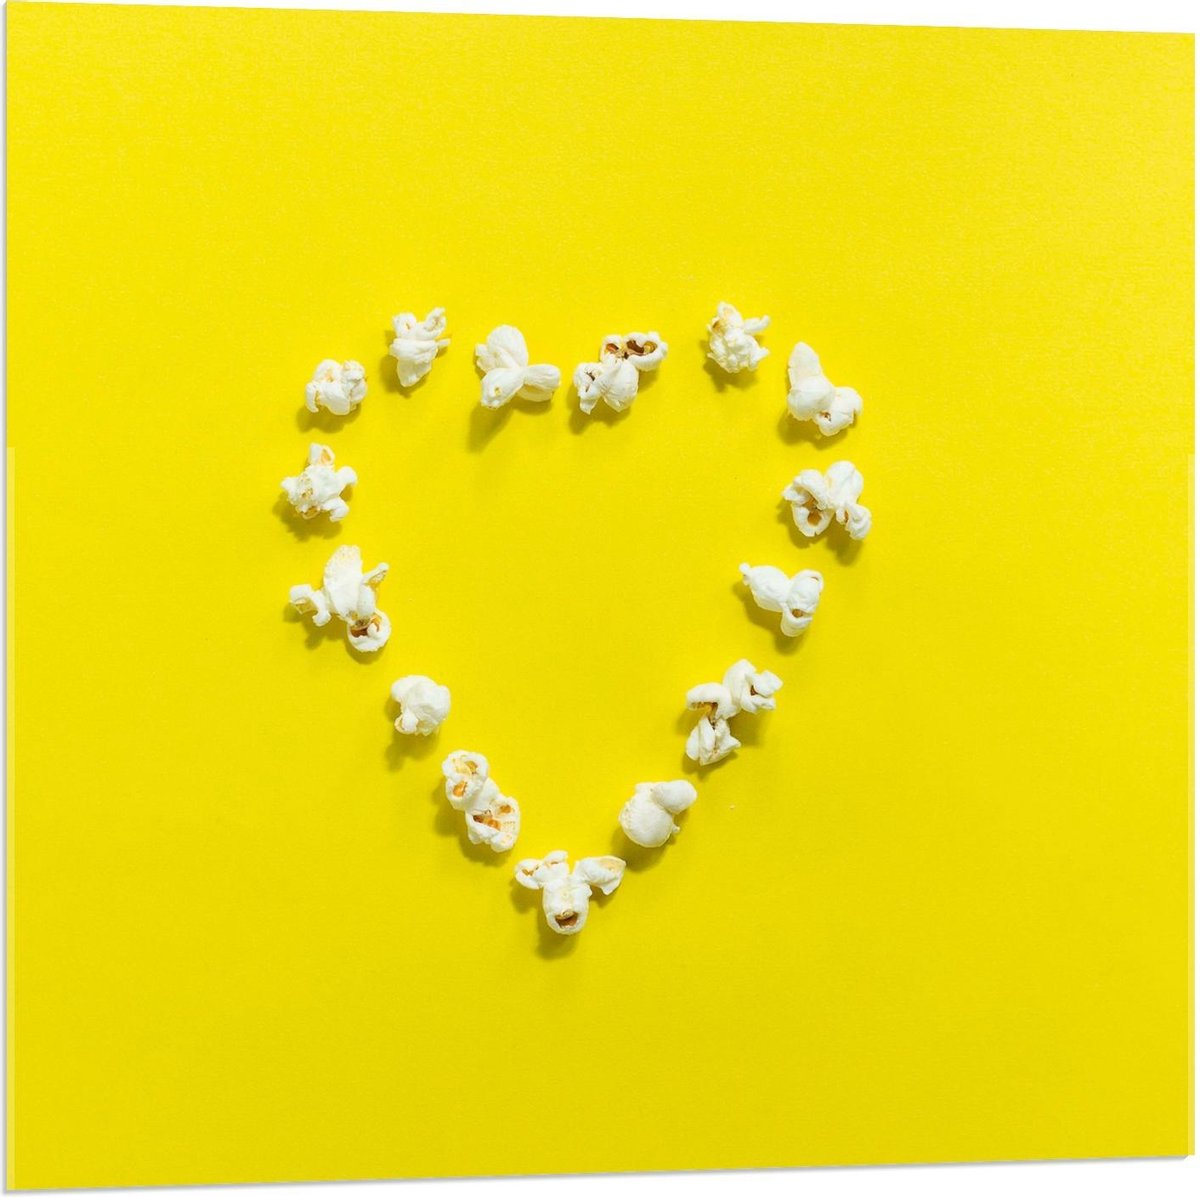 Plexiglas - Popcorn op Gele Achtergrond - 80x80cm Foto op Plexiglas (Met Ophangsysteem)